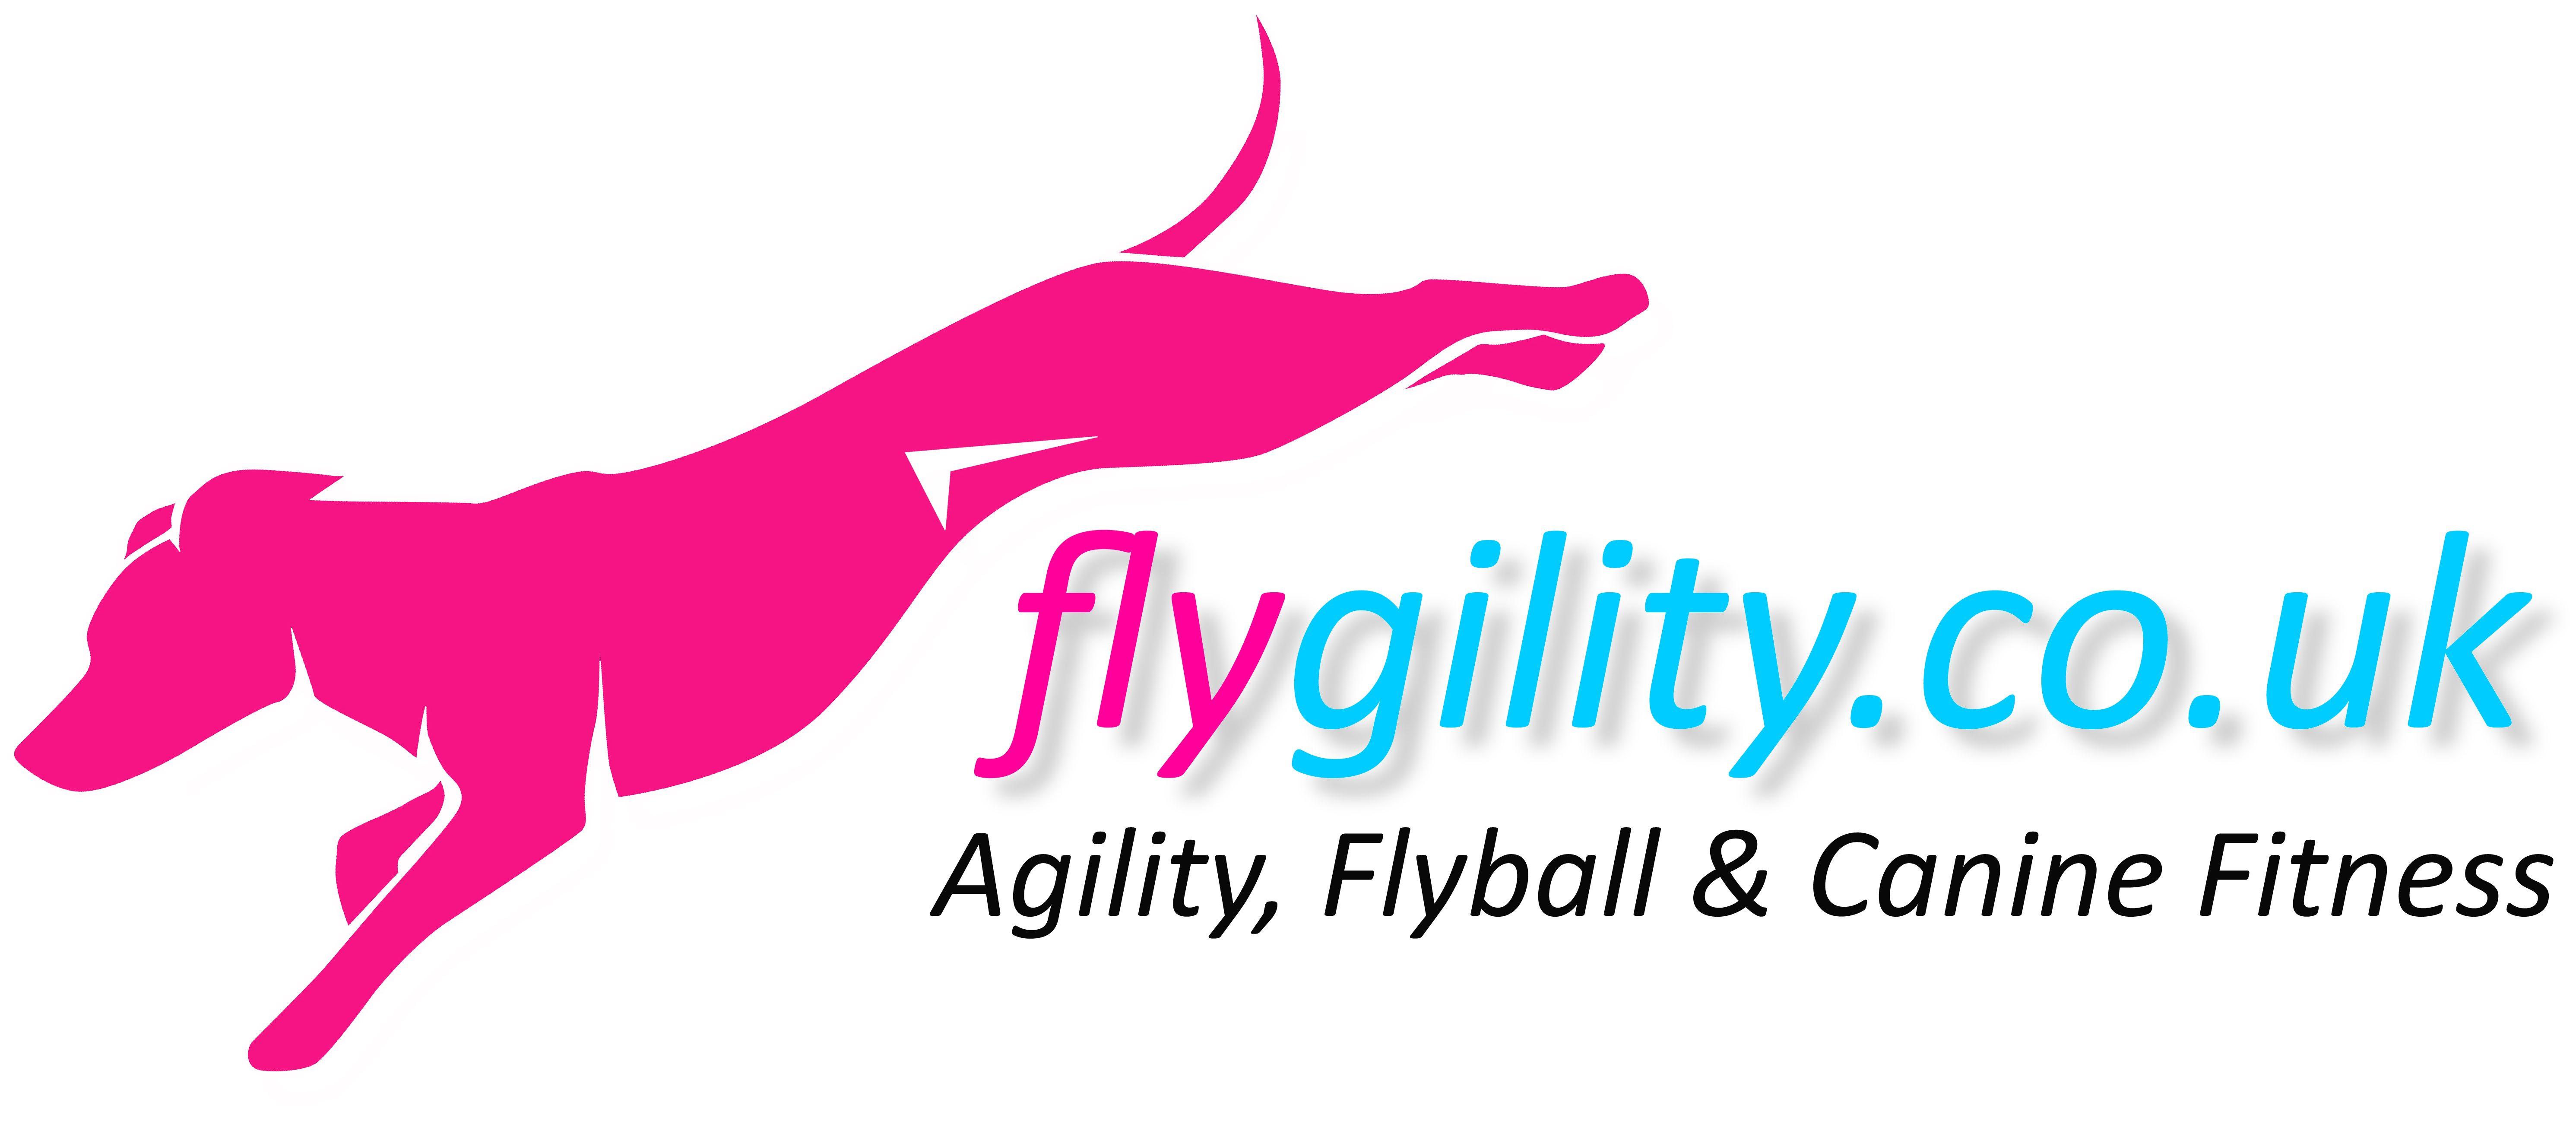 flygility